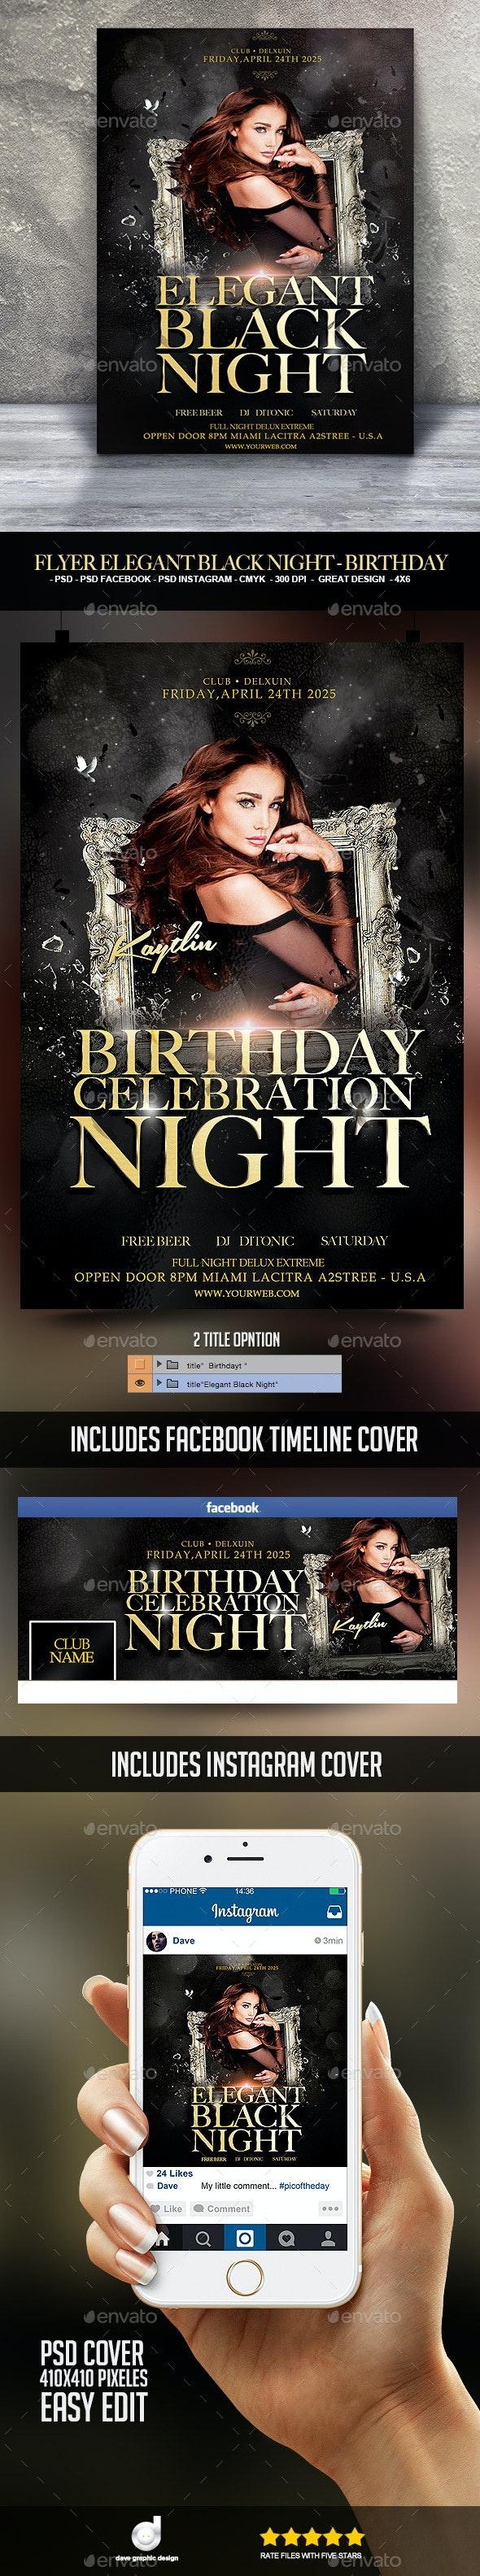 Flyer Elegant Black Night - Birthday - Clubs & Parties Events